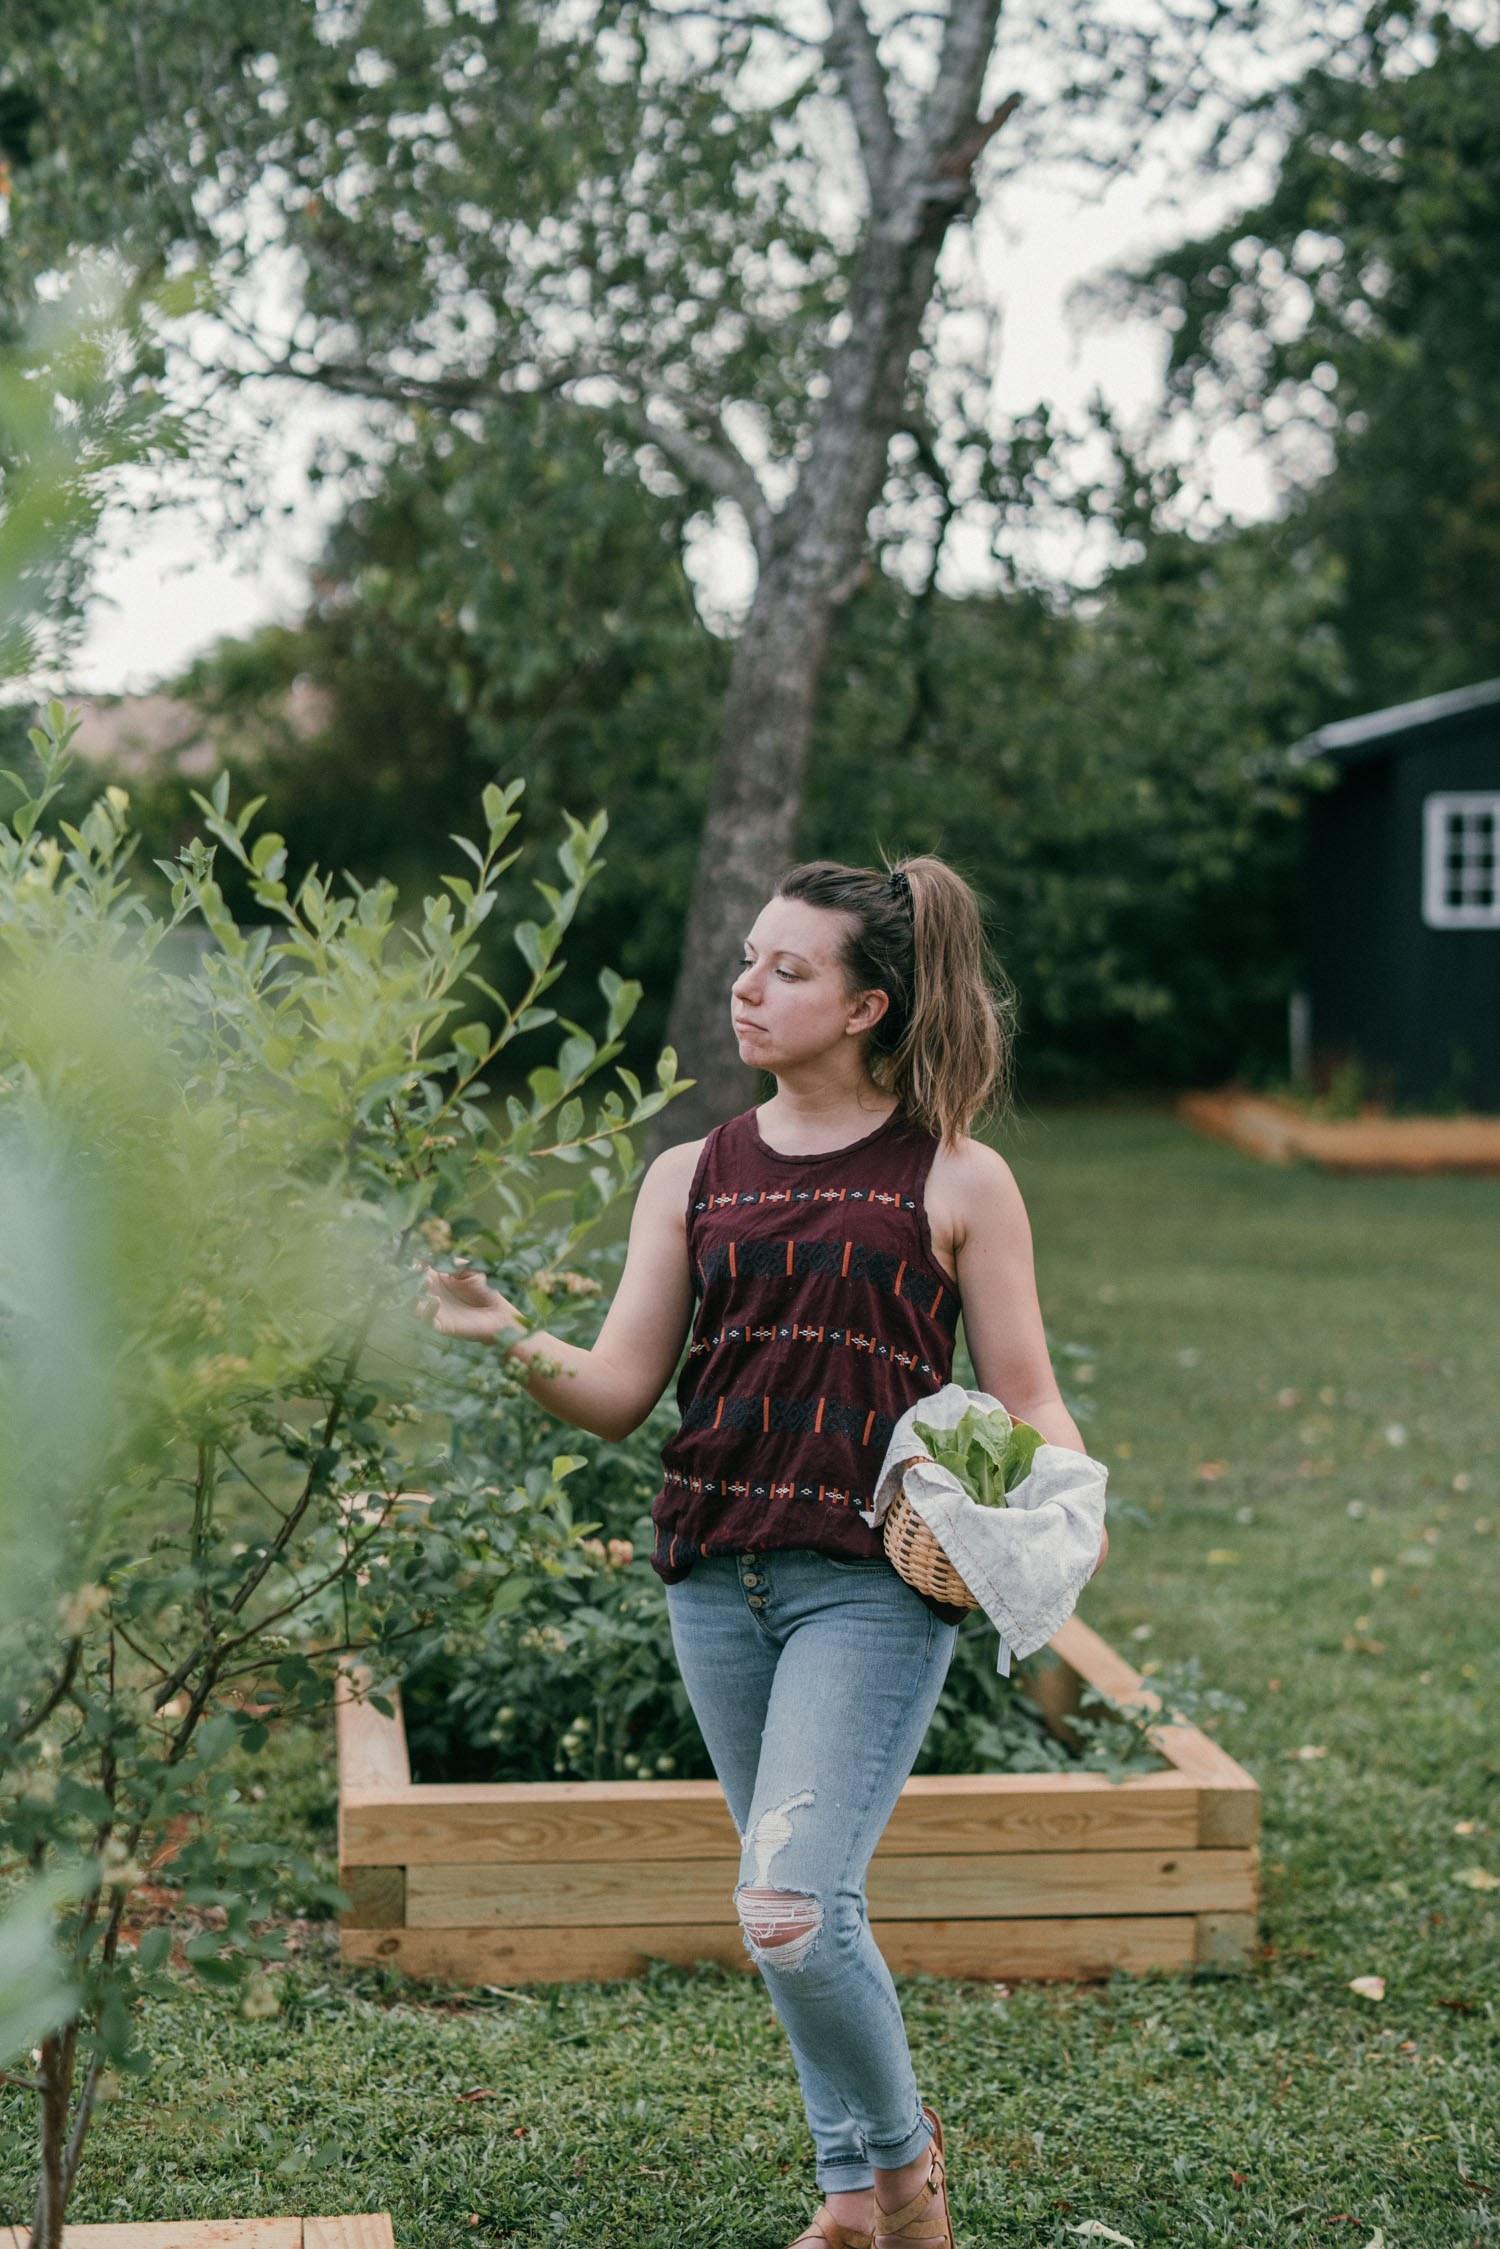 Gardening 9